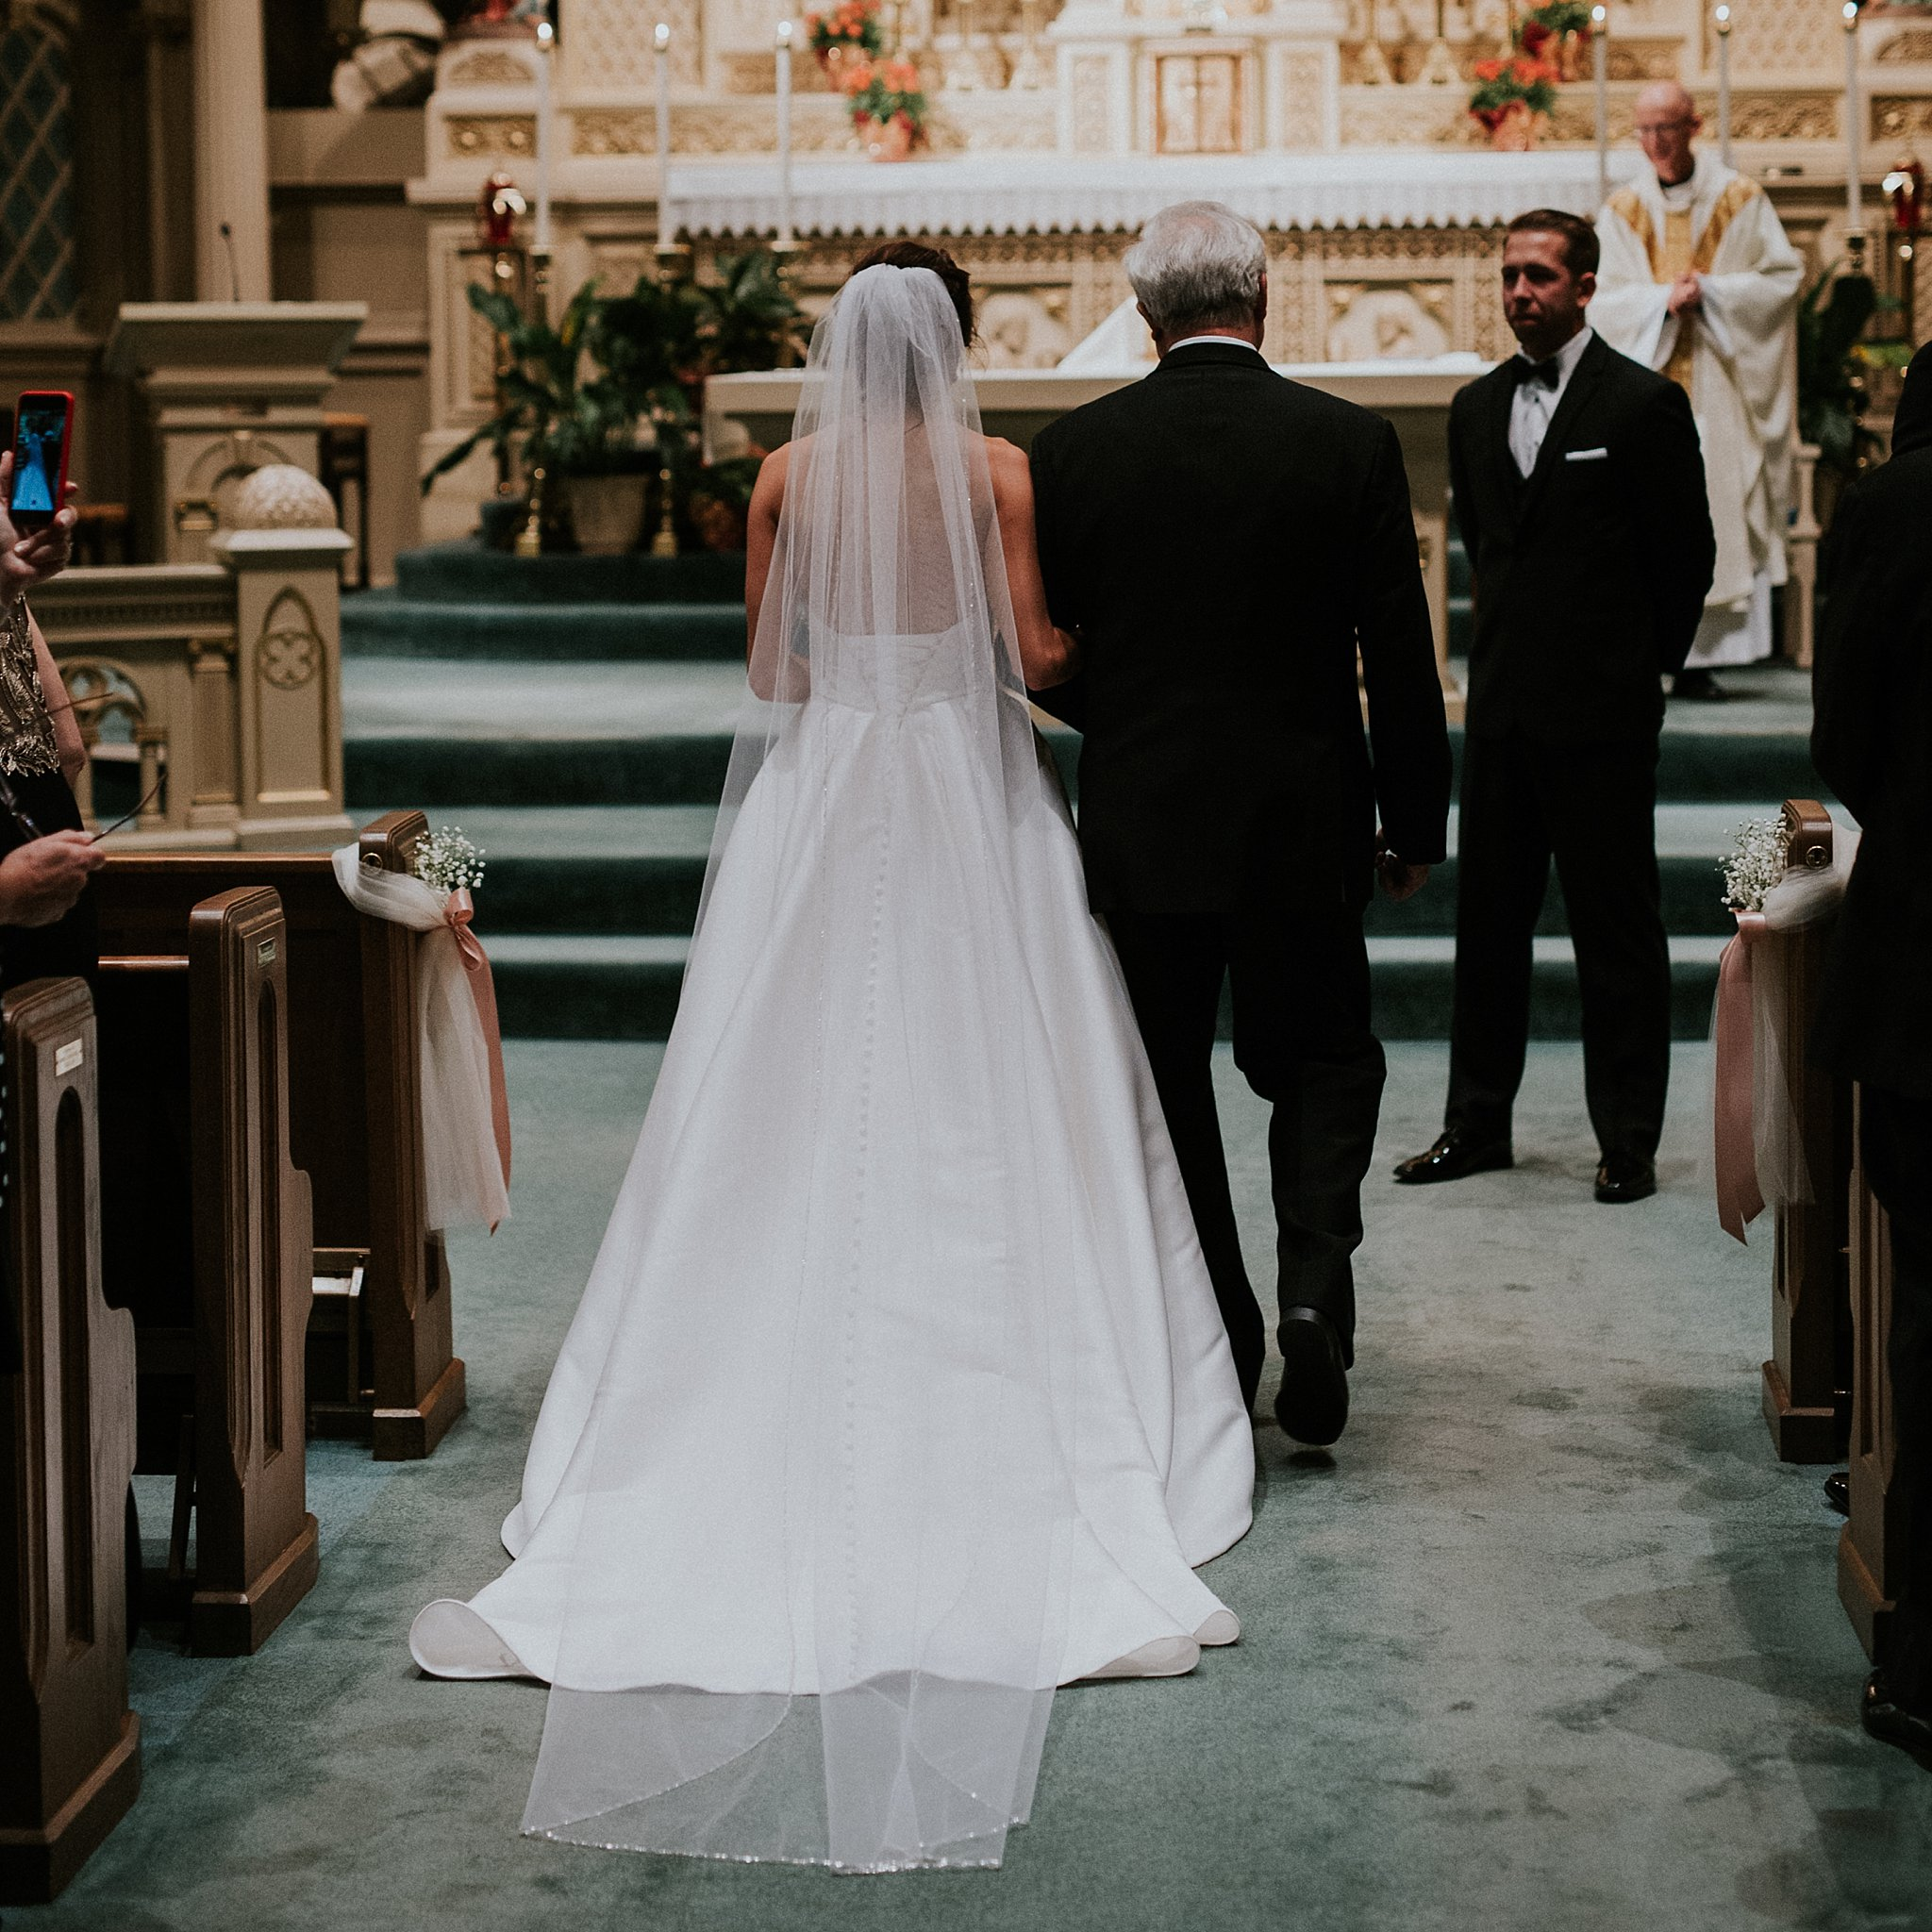 Matt-Lauren_St-Marys_Hilton-City-Center-Milwaukee-Wedding_liller-photo_0017.jpg